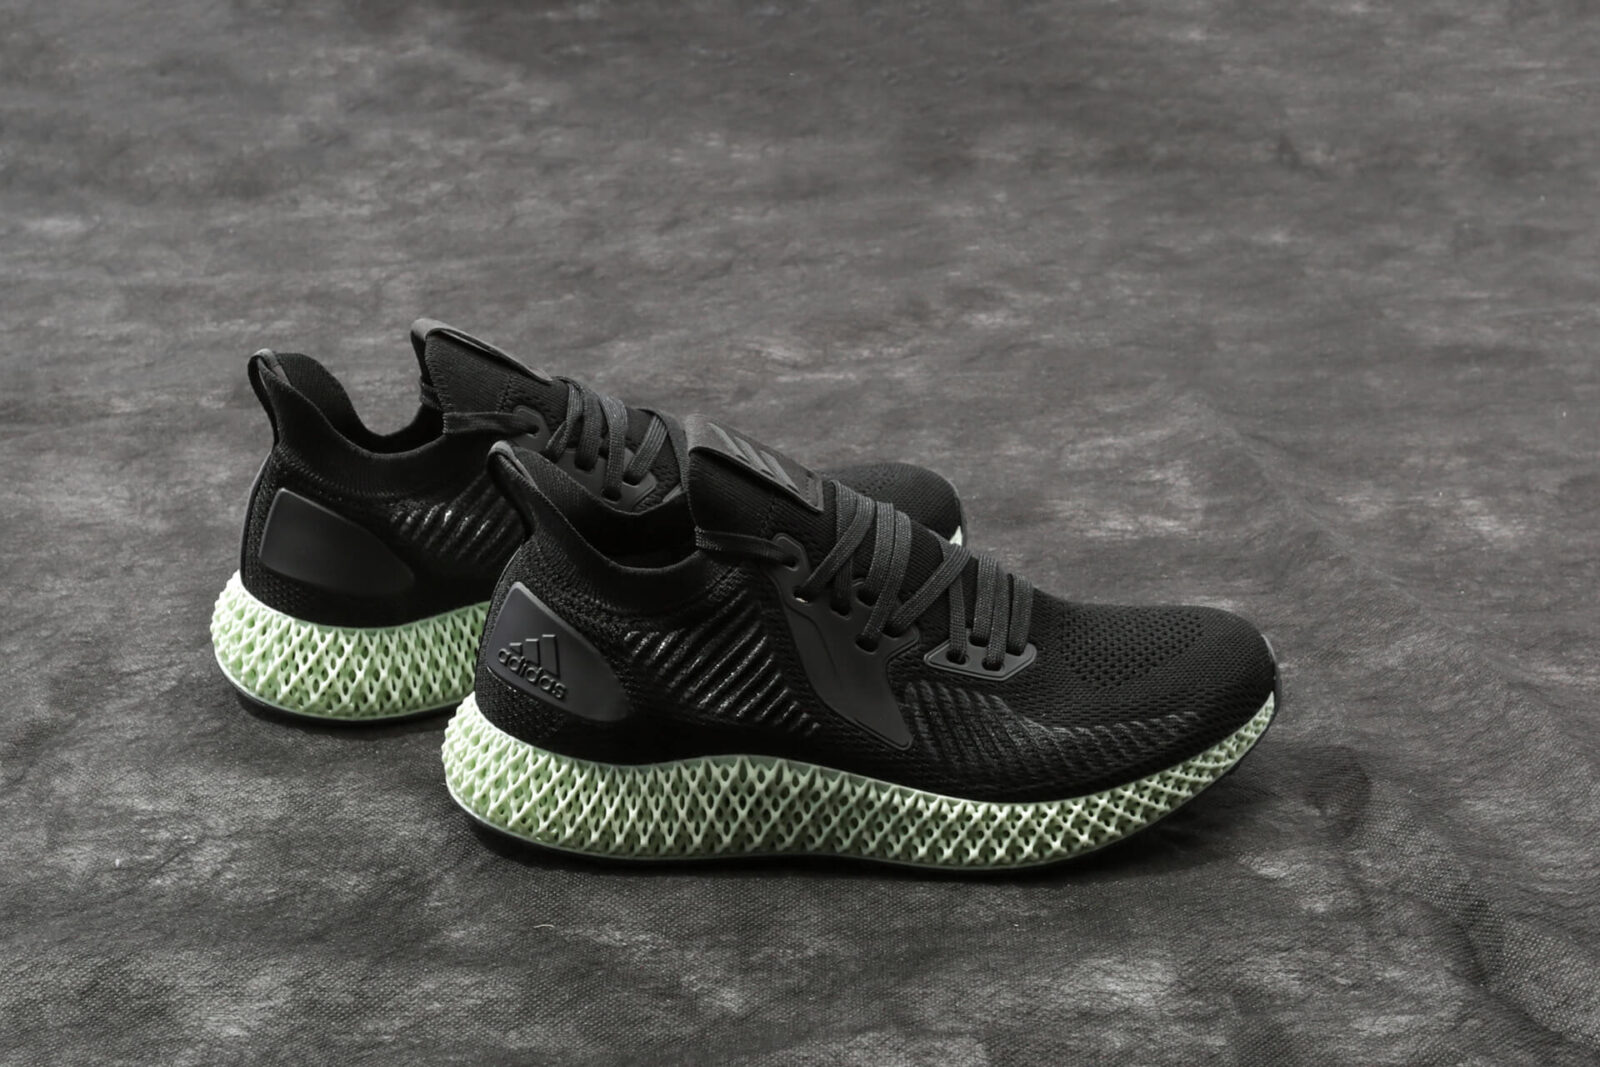 adidas Alphaedge 4D 'Core Black